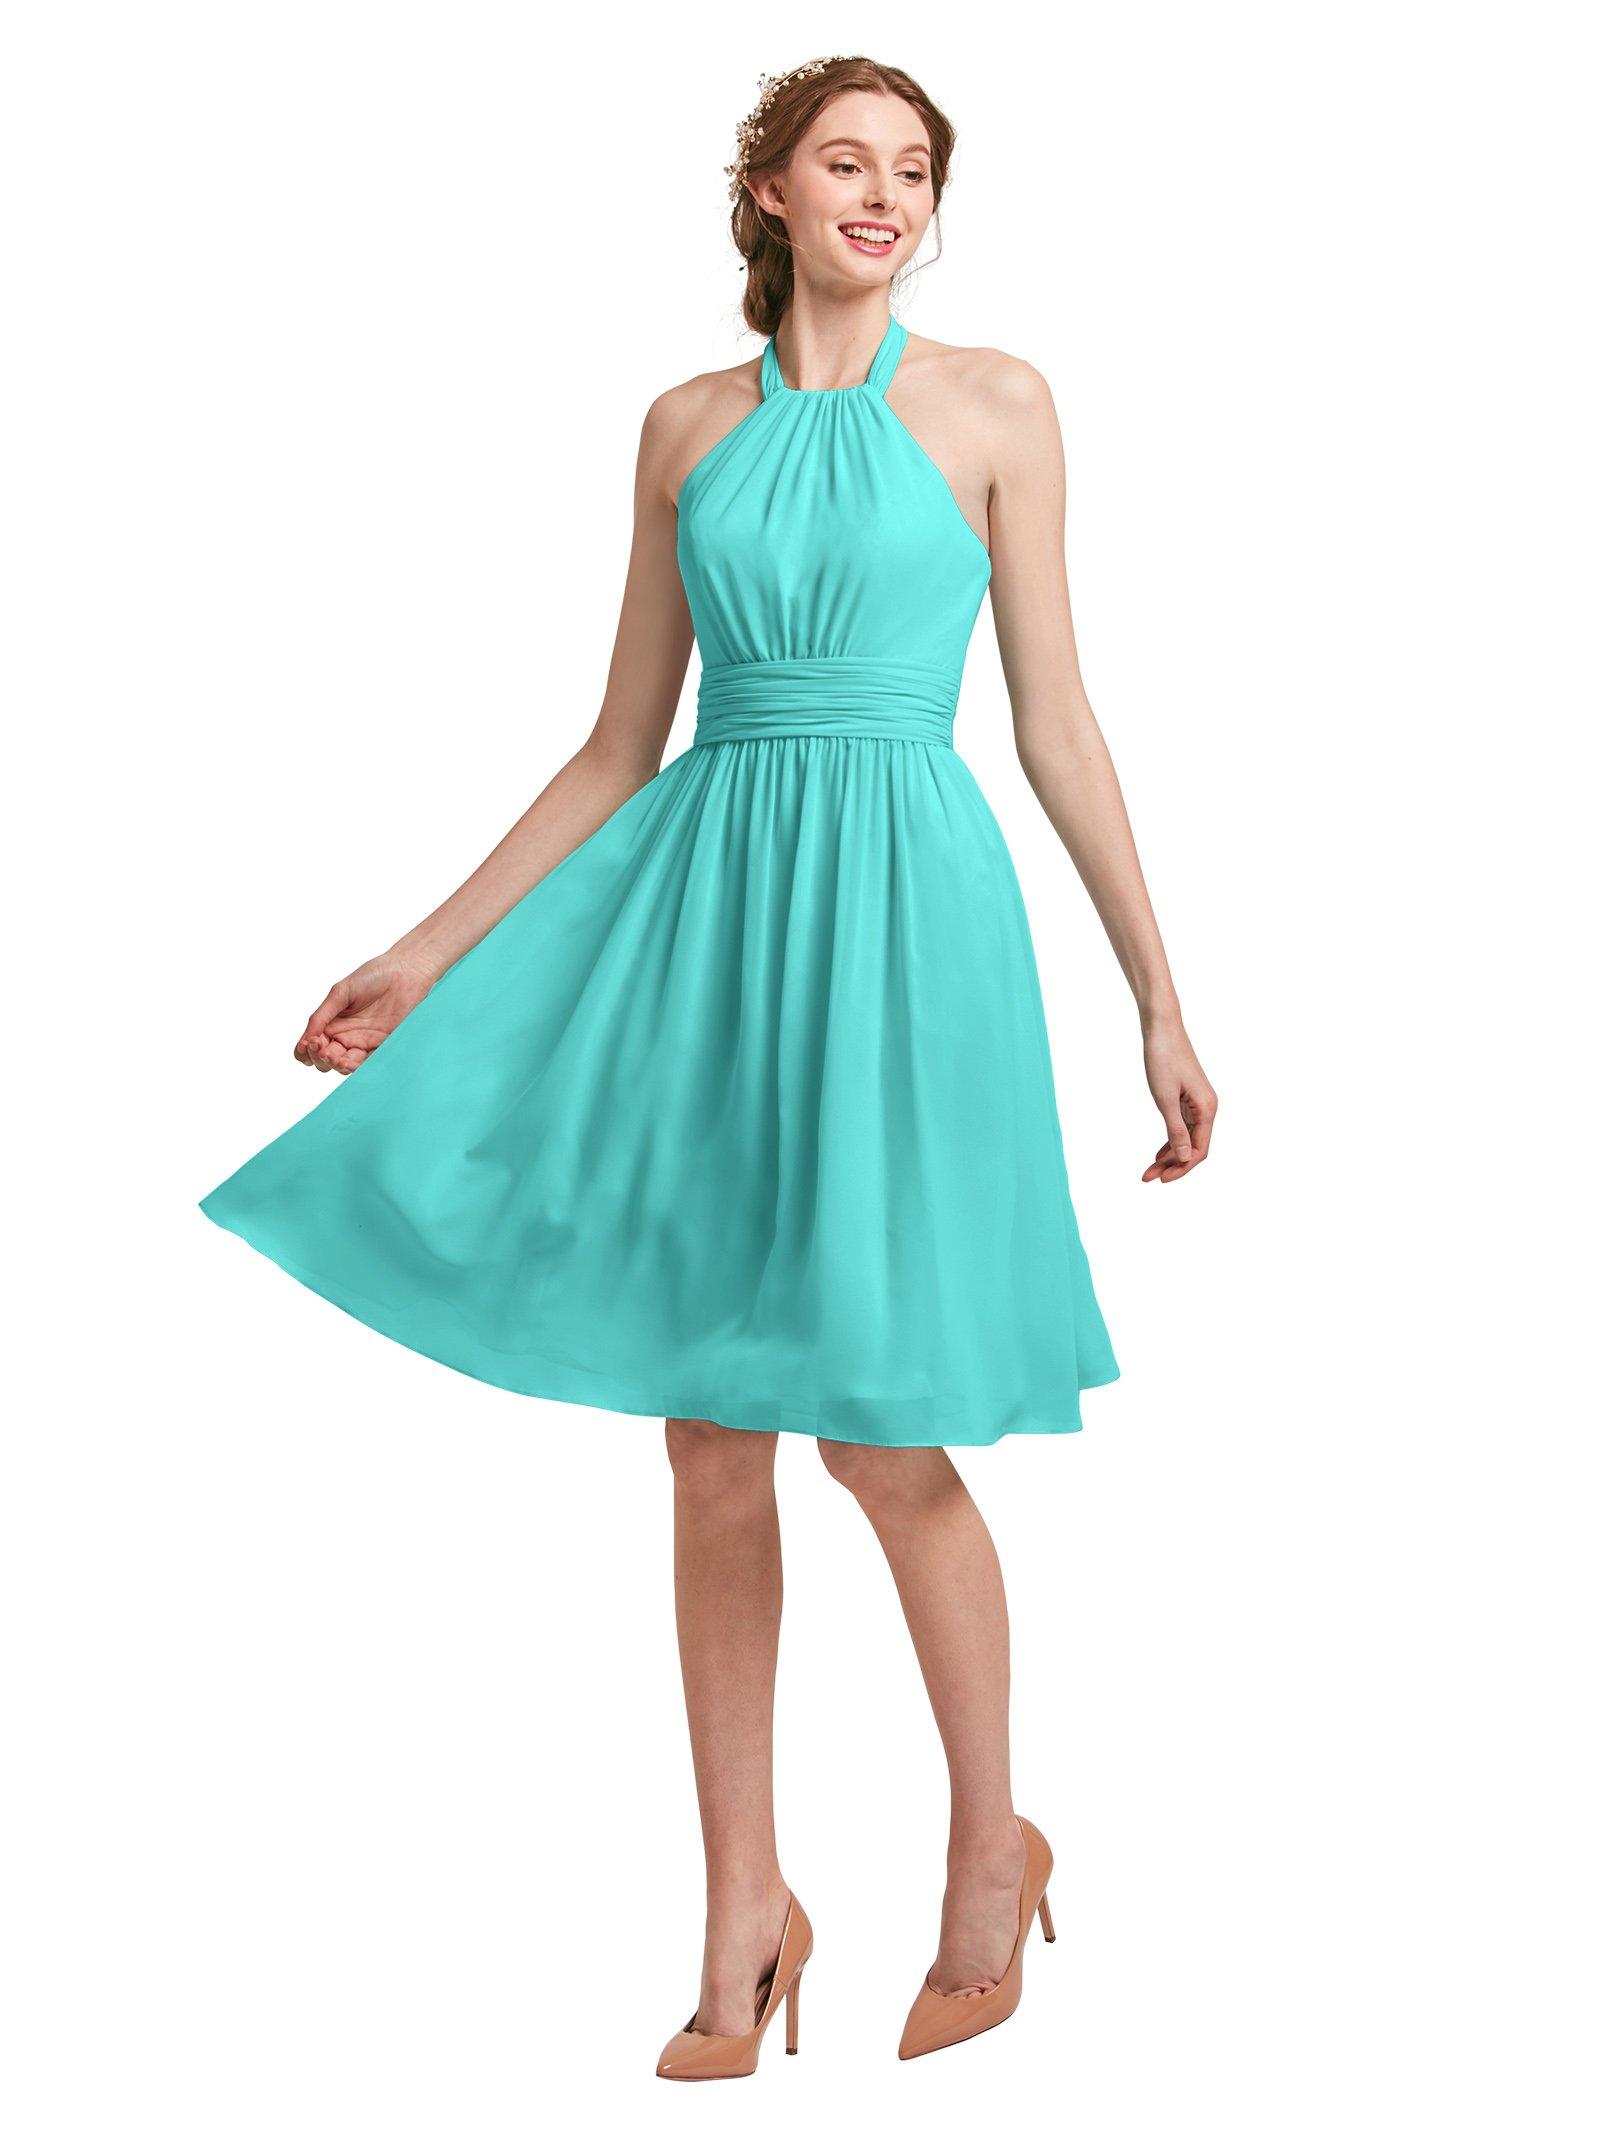 Aw Halter Bridesmaid Dress Short Chiffon Prom Formal Dresses For Wedding Guest Women Tiffany Us8,2020 Wedding Dresses Trends In Pakistan